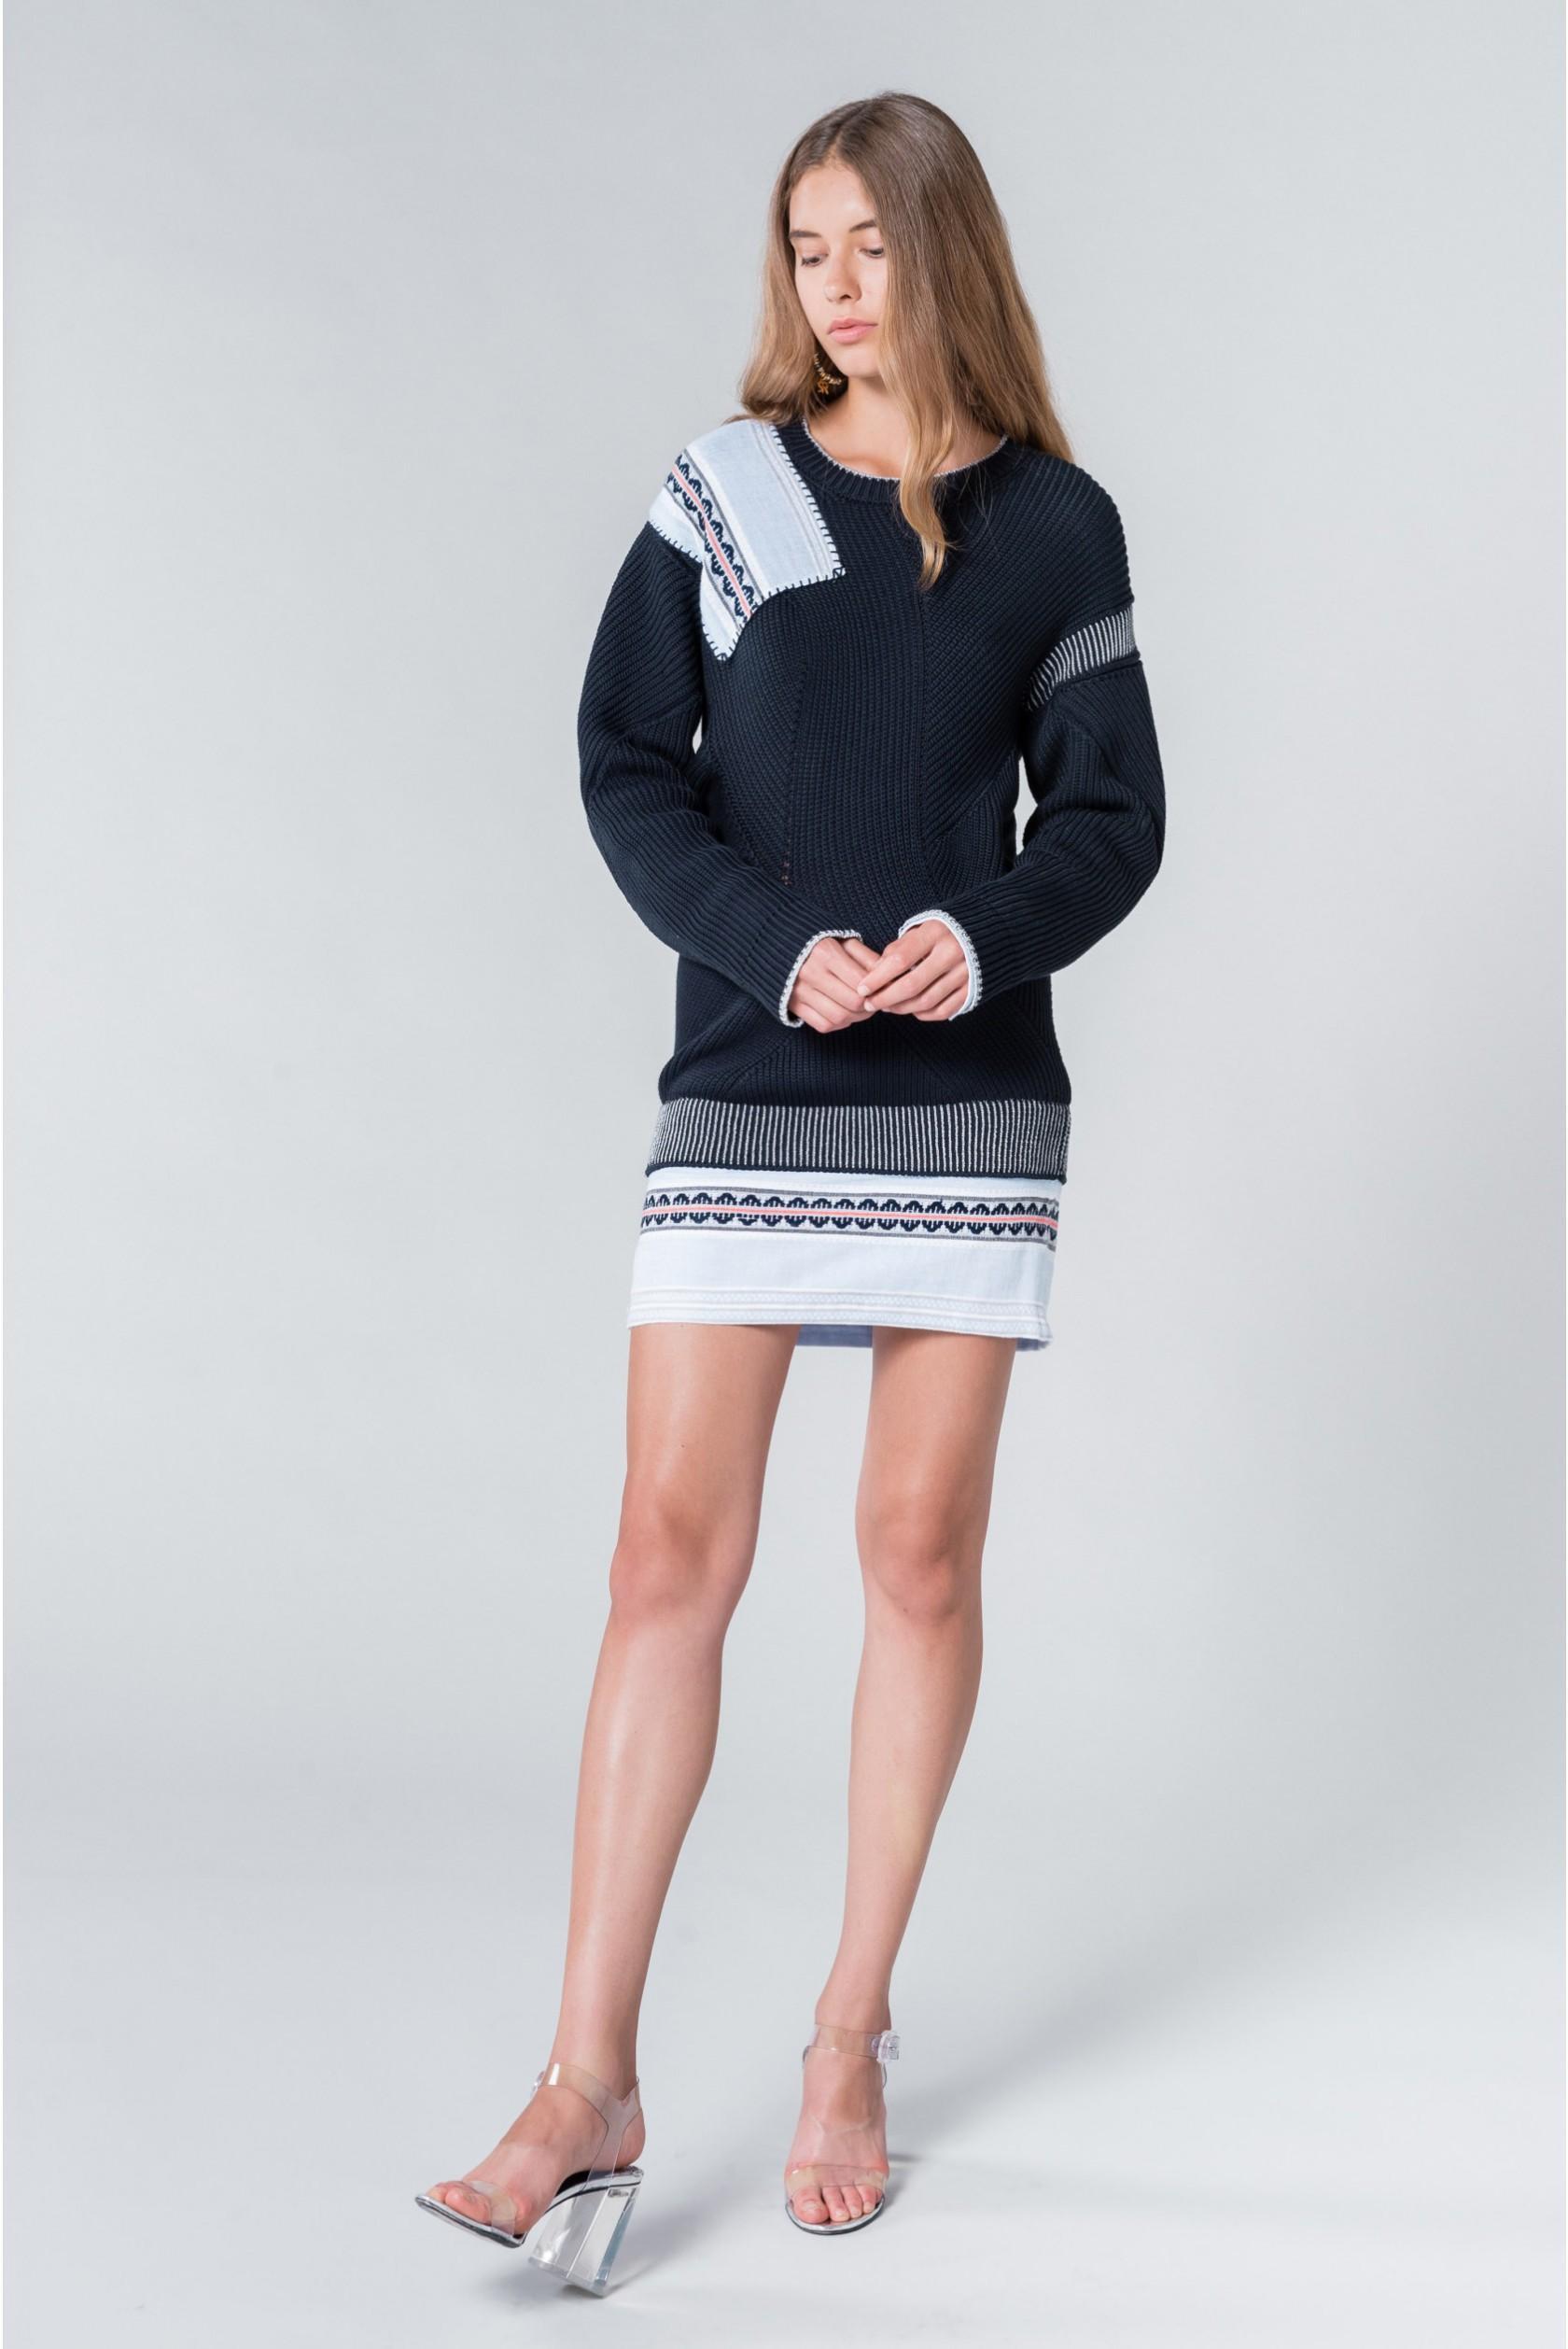 bd902b3eb1b Sonia Rykiel. Women's Blue Generous Sweater Liya Kebede. $1,640 From Orchard  Mile